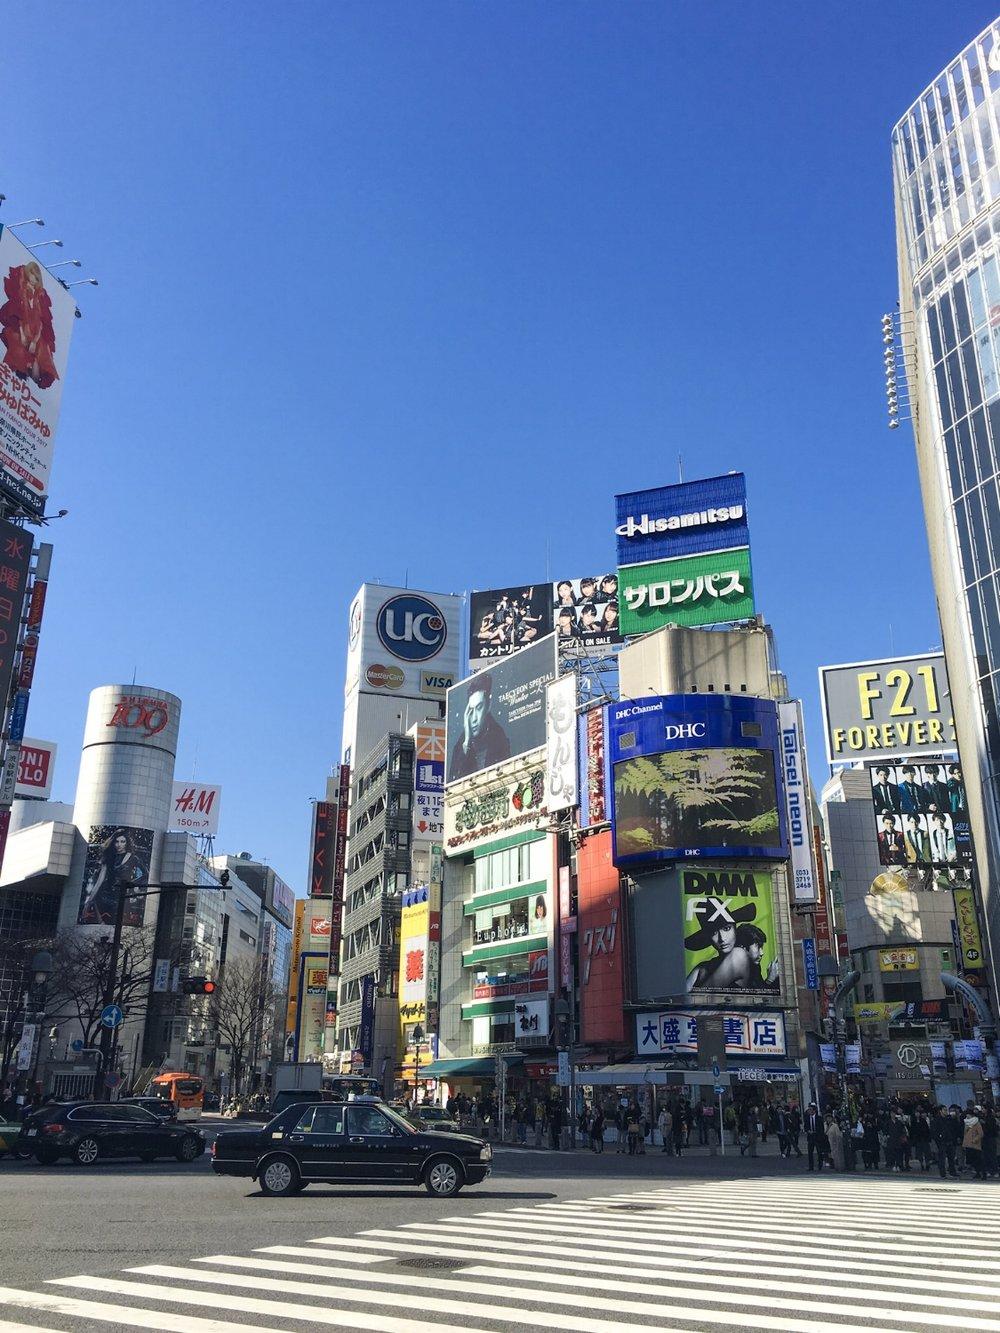 TAKE IT ALL IN THE METROPOLIS OF TOKYO